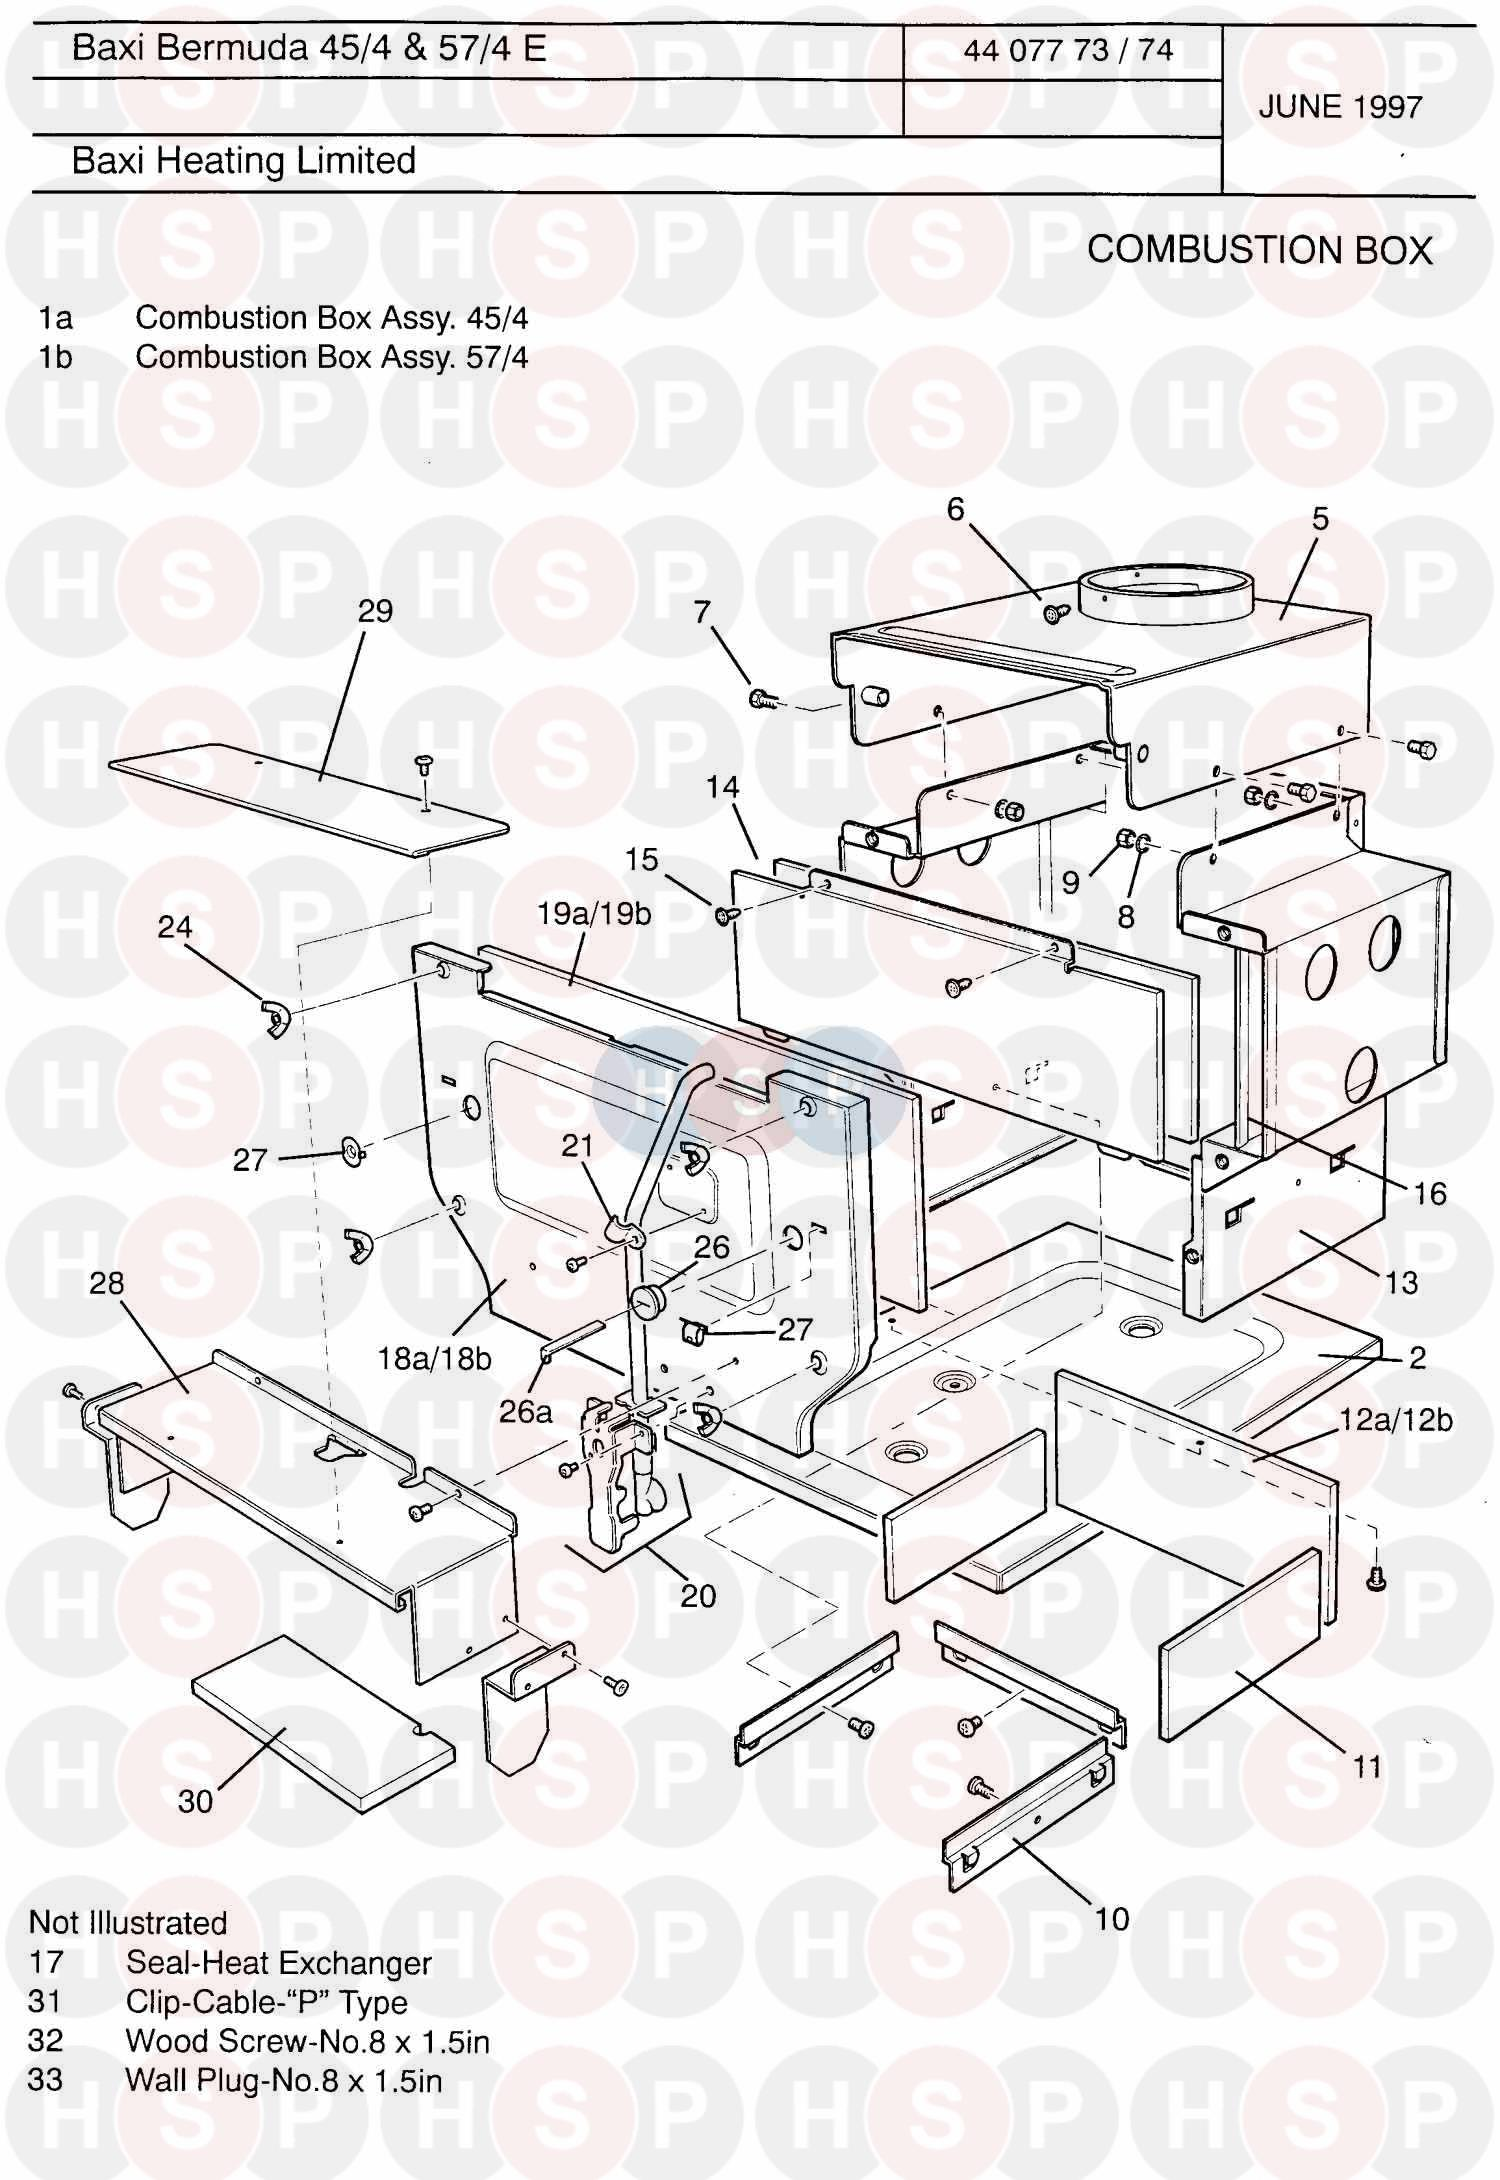 Baxi BERMUDA 57/4 ELECTRONIC (Combustion Box) Diagram